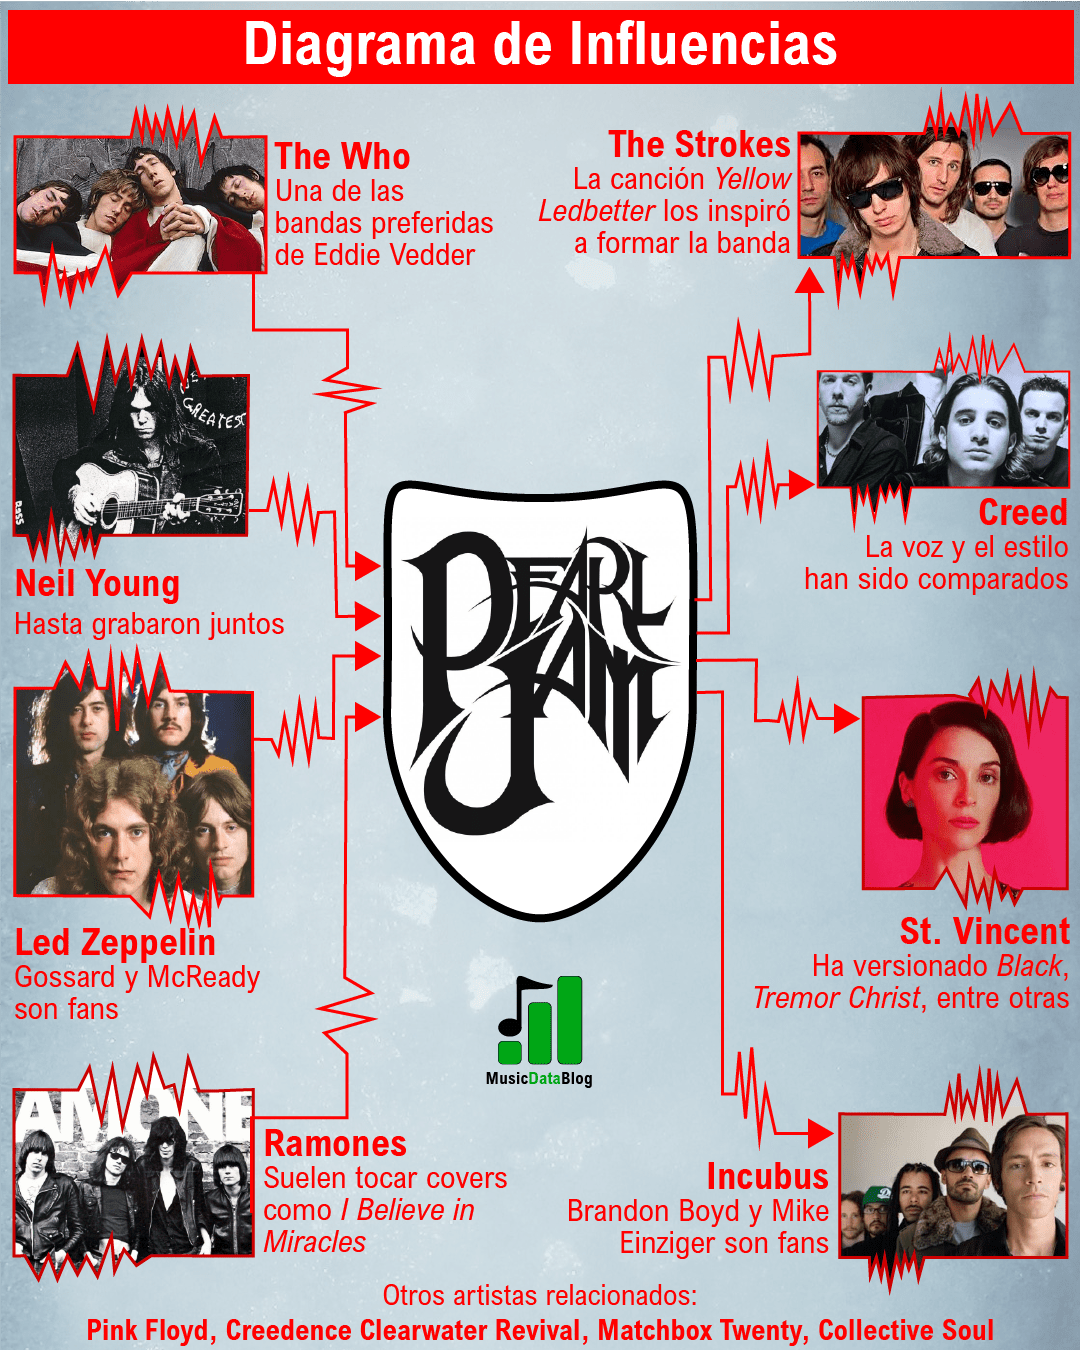 pearl jam influencias grunge